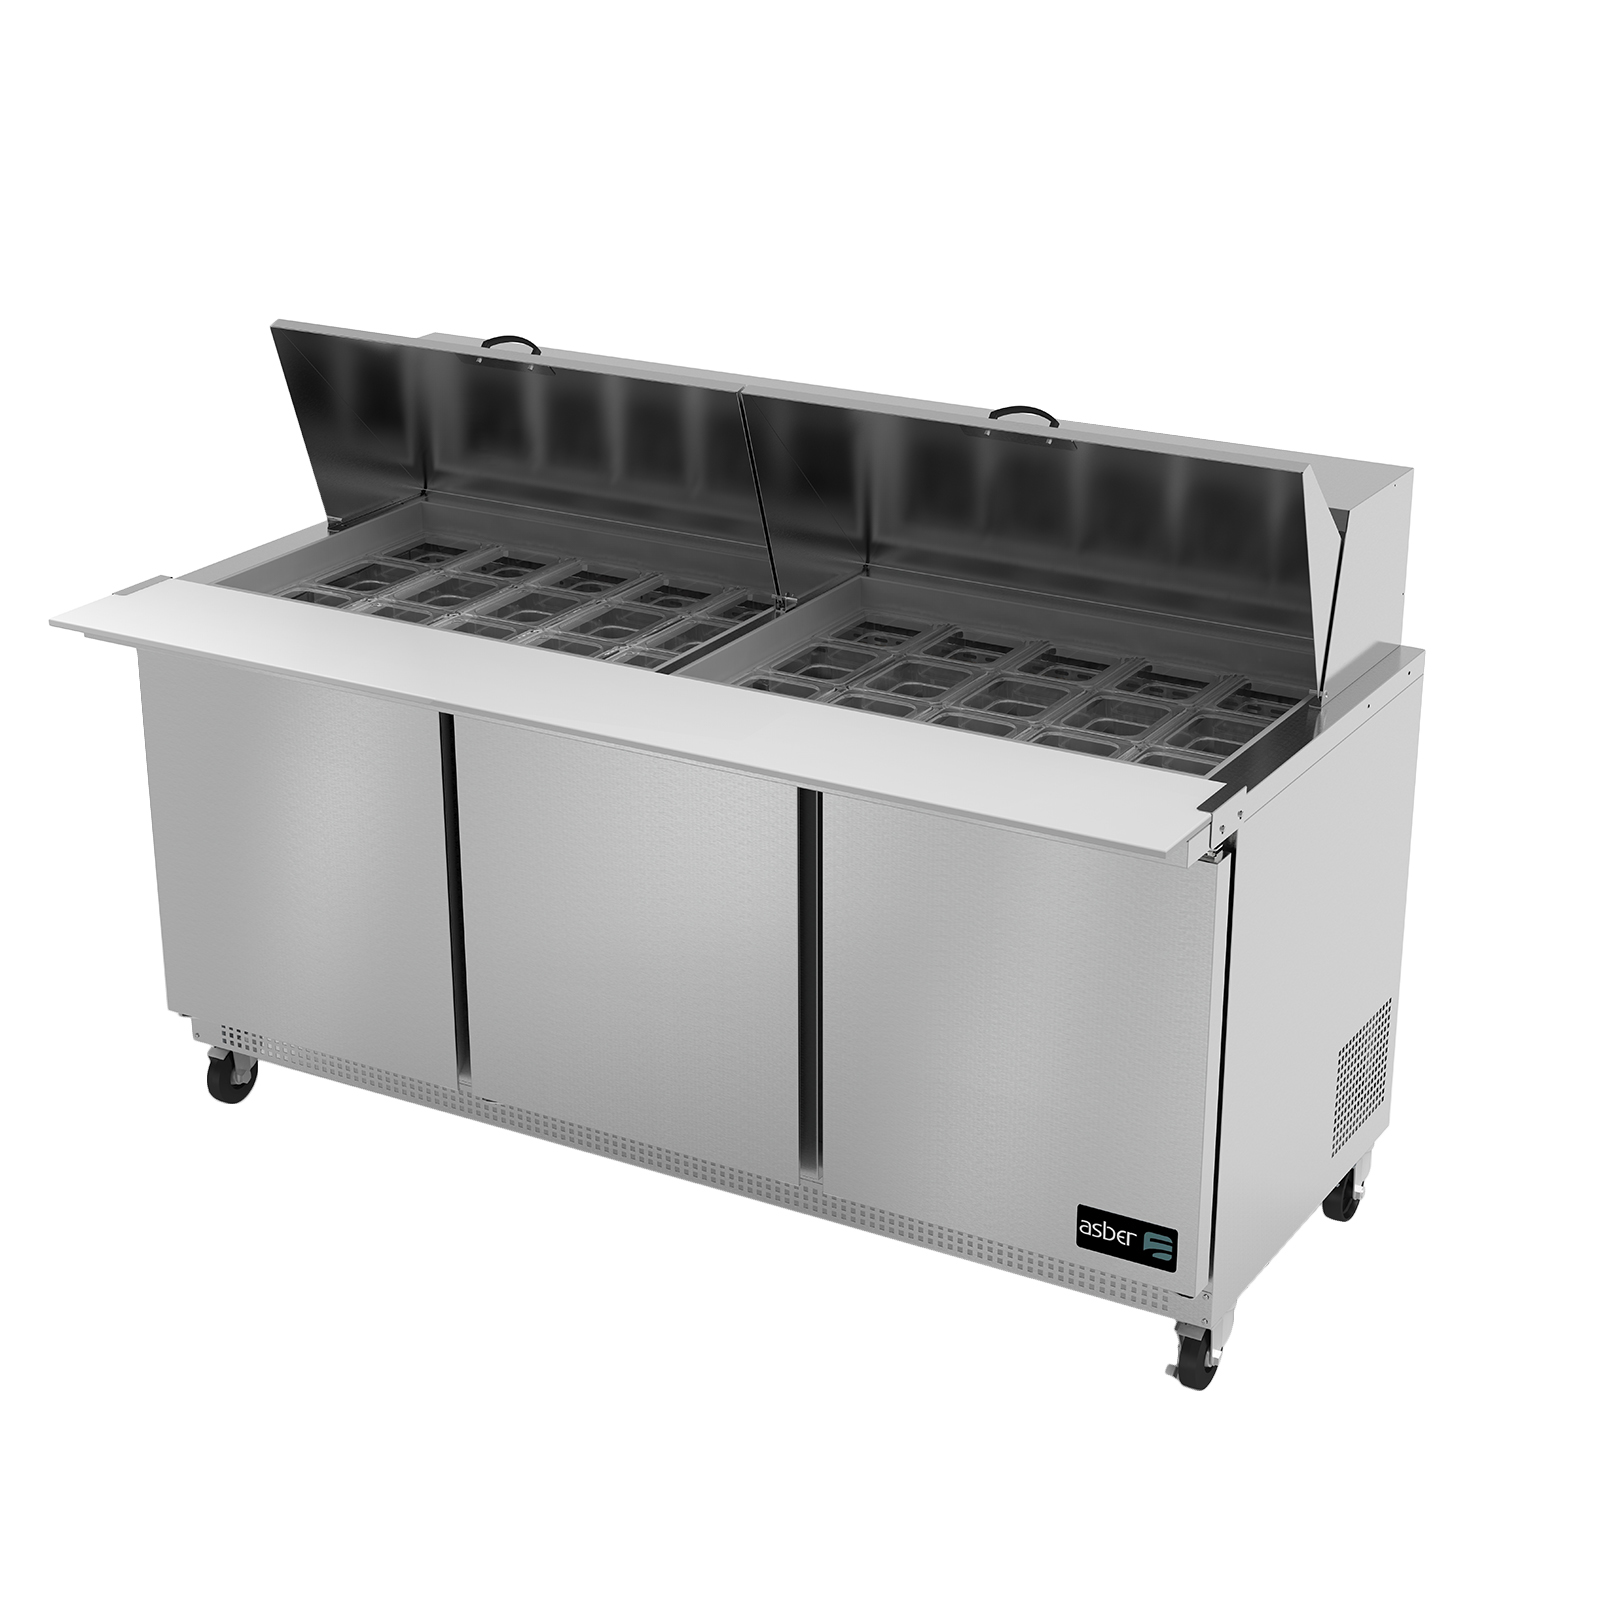 Asber APTM-72-30 refrigerated counter, mega top sandwich / salad unit